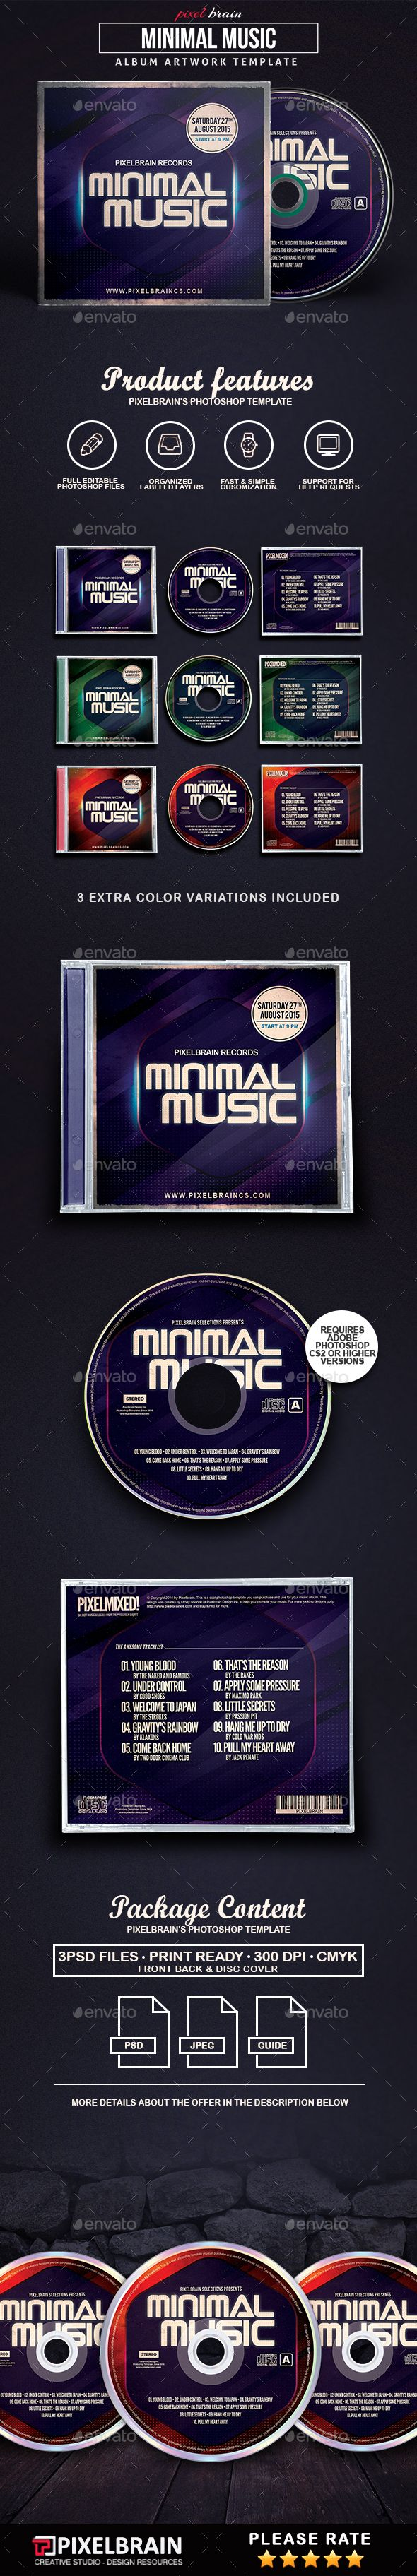 Minimal Music CD Album Artwork Vol. 1